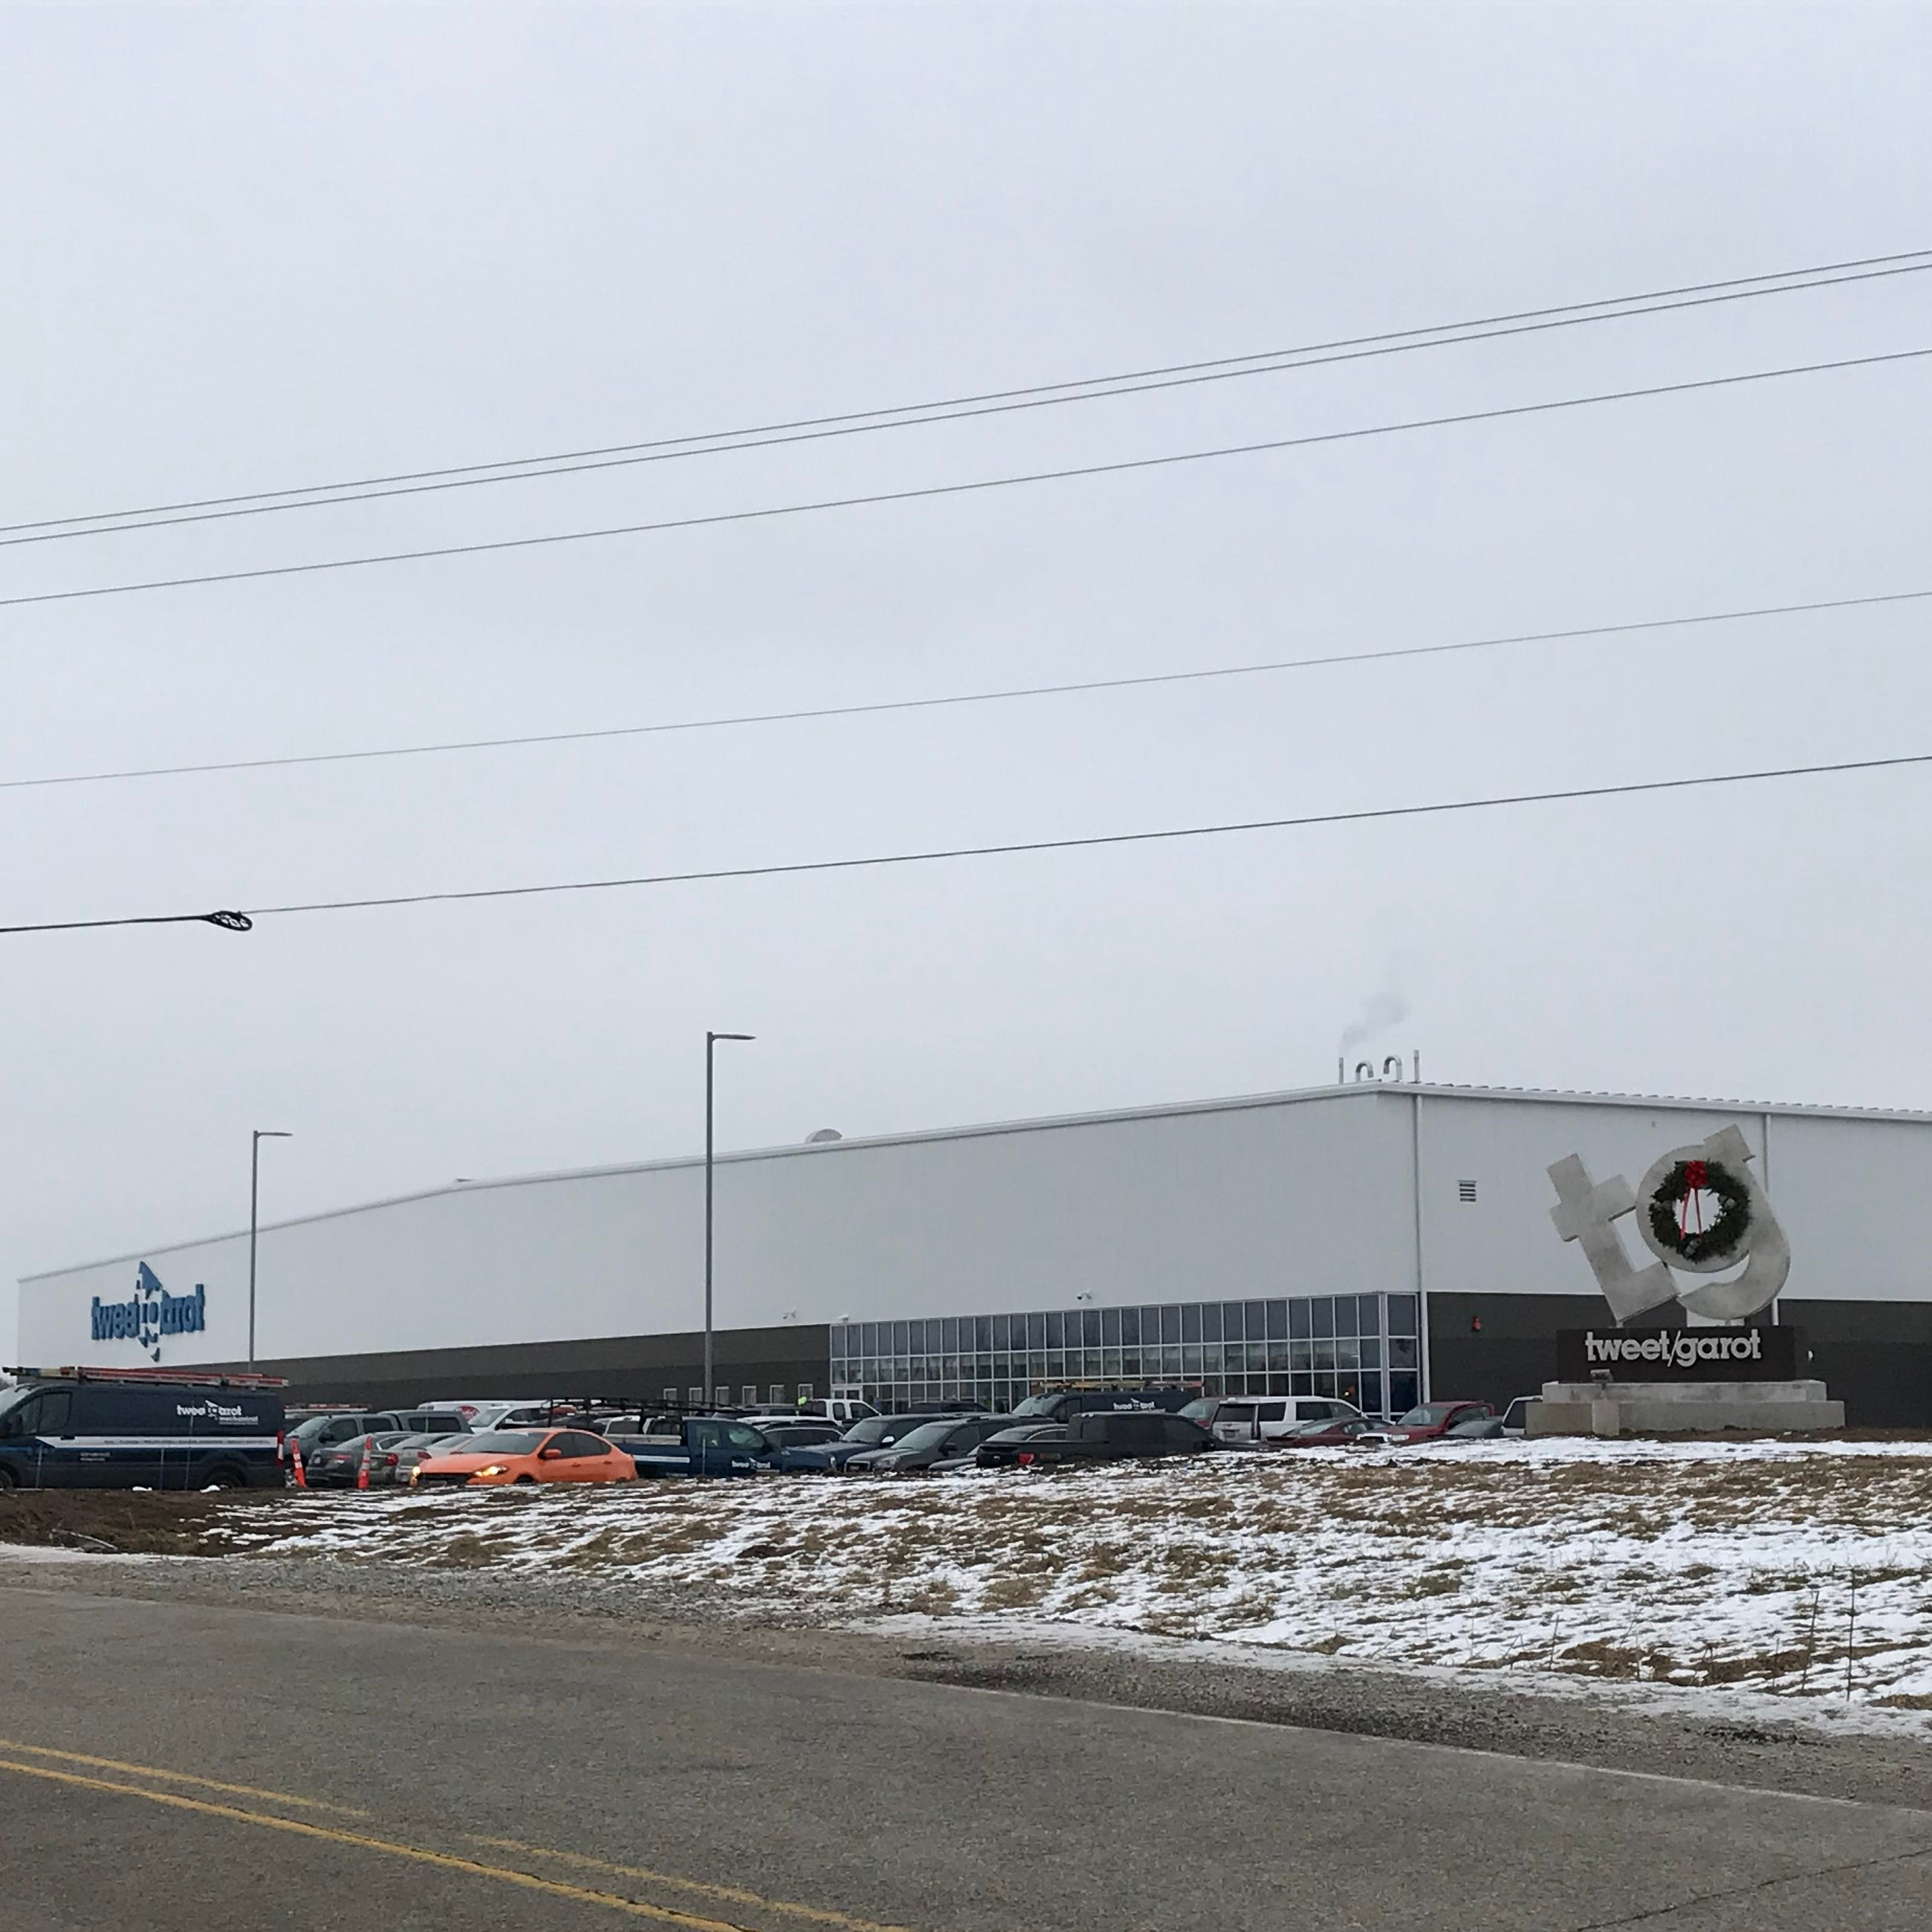 Tweet/Garot opens Wrightstown manufacturing center | Streetwise